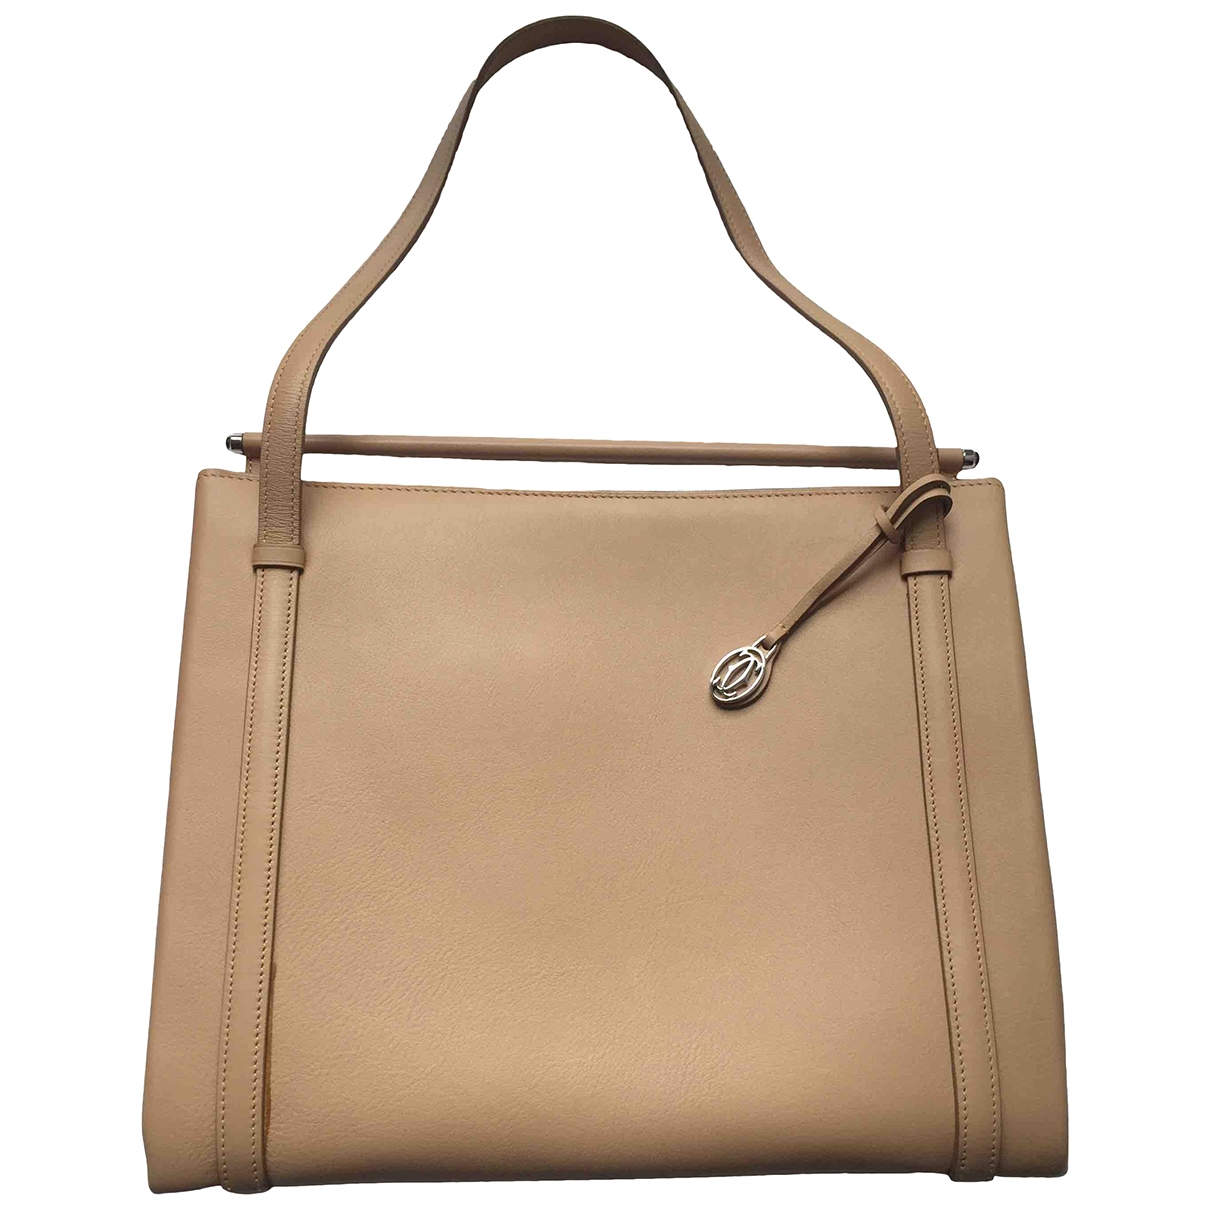 Cartier \N Beige Leather handbag for Women \N